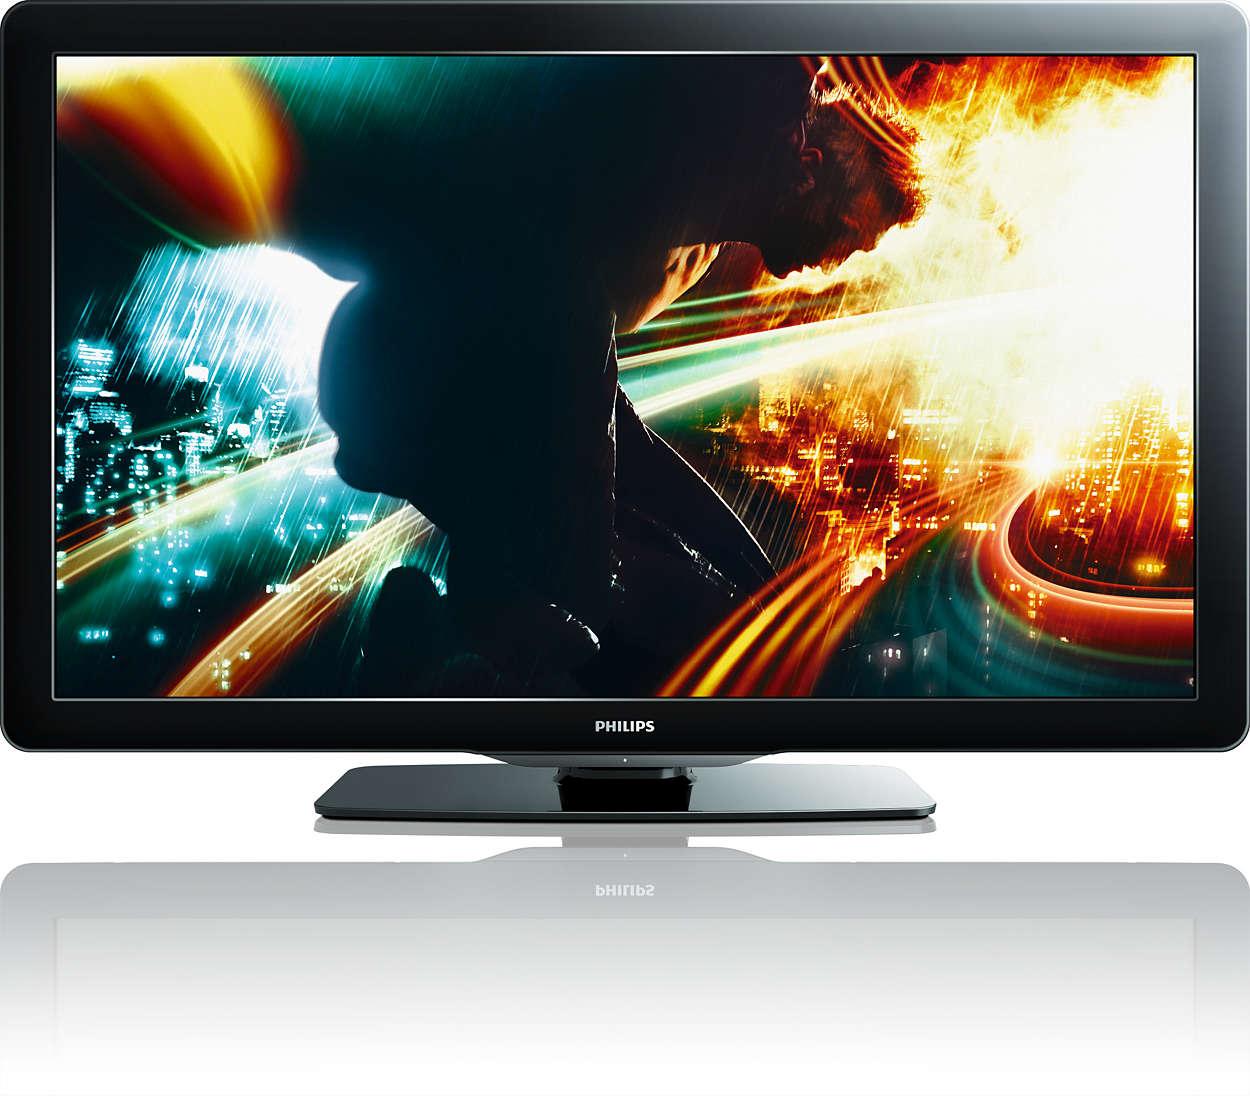 philips tv model 46pfl5706 f7 manual